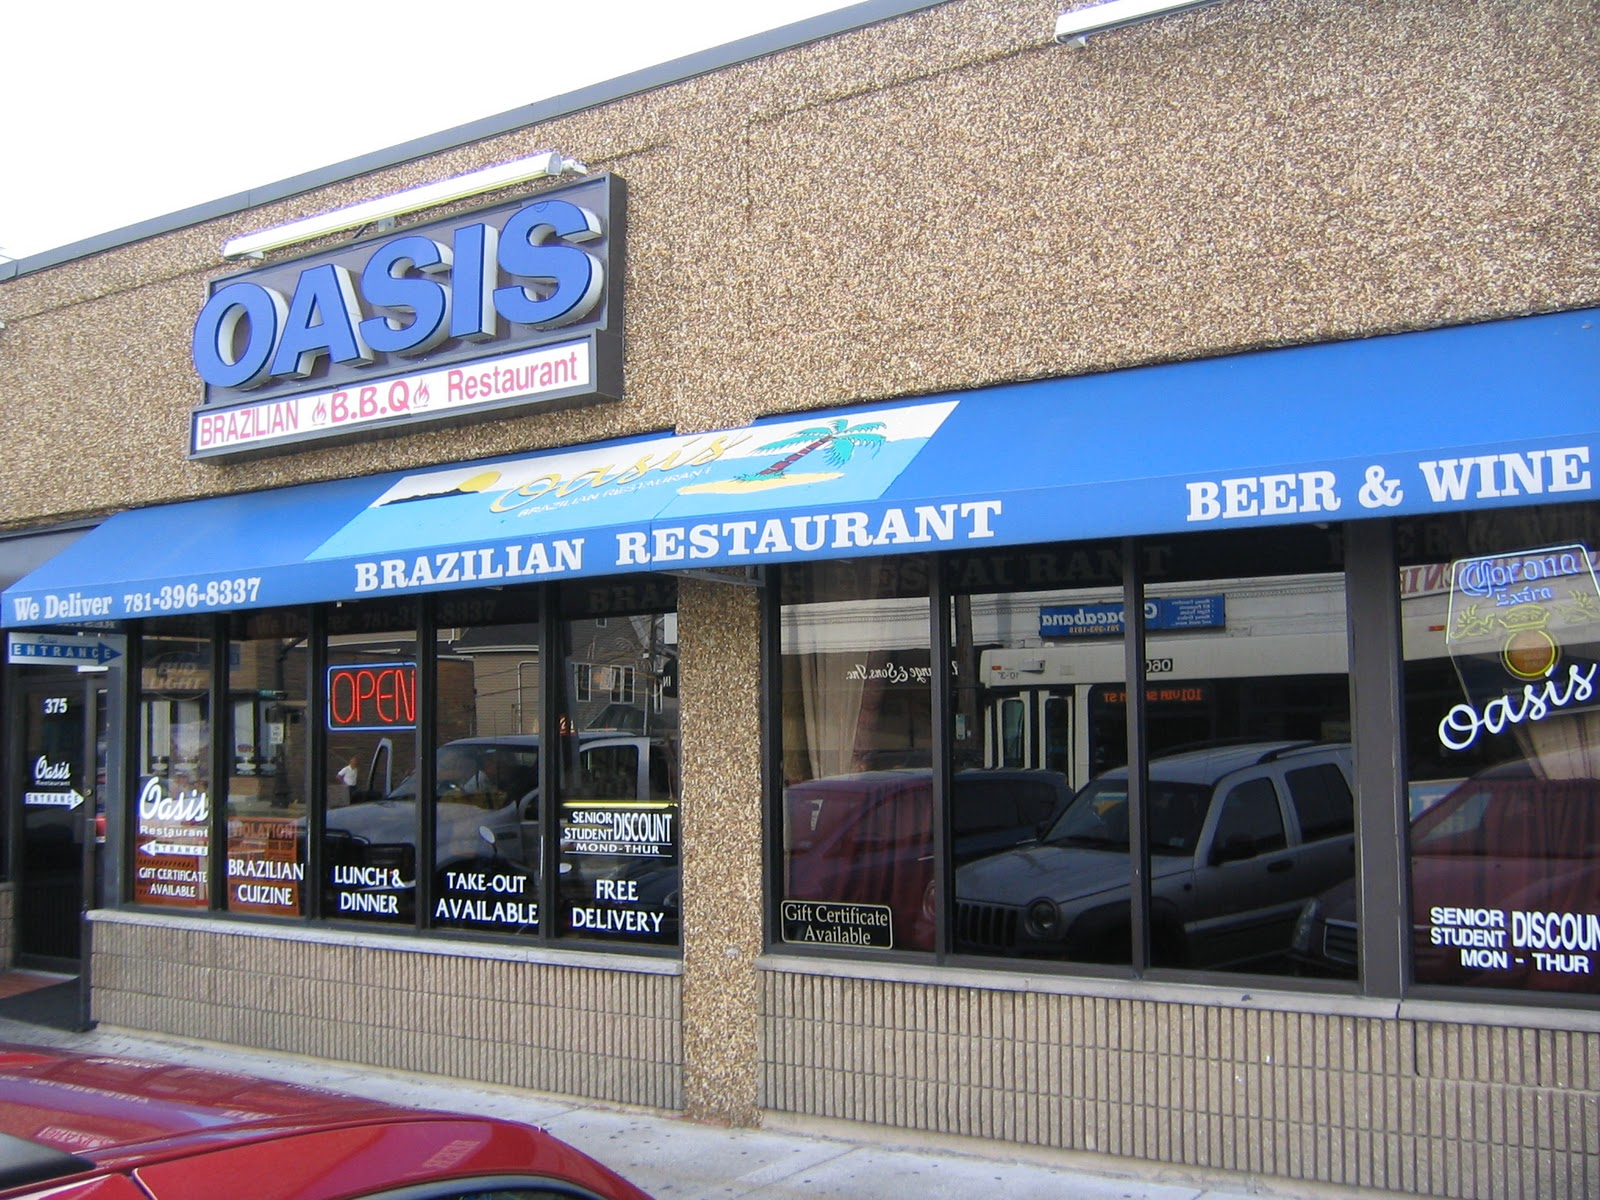 Oasis Brazilian Restaurant 373 Main Street Medford Ma 02155